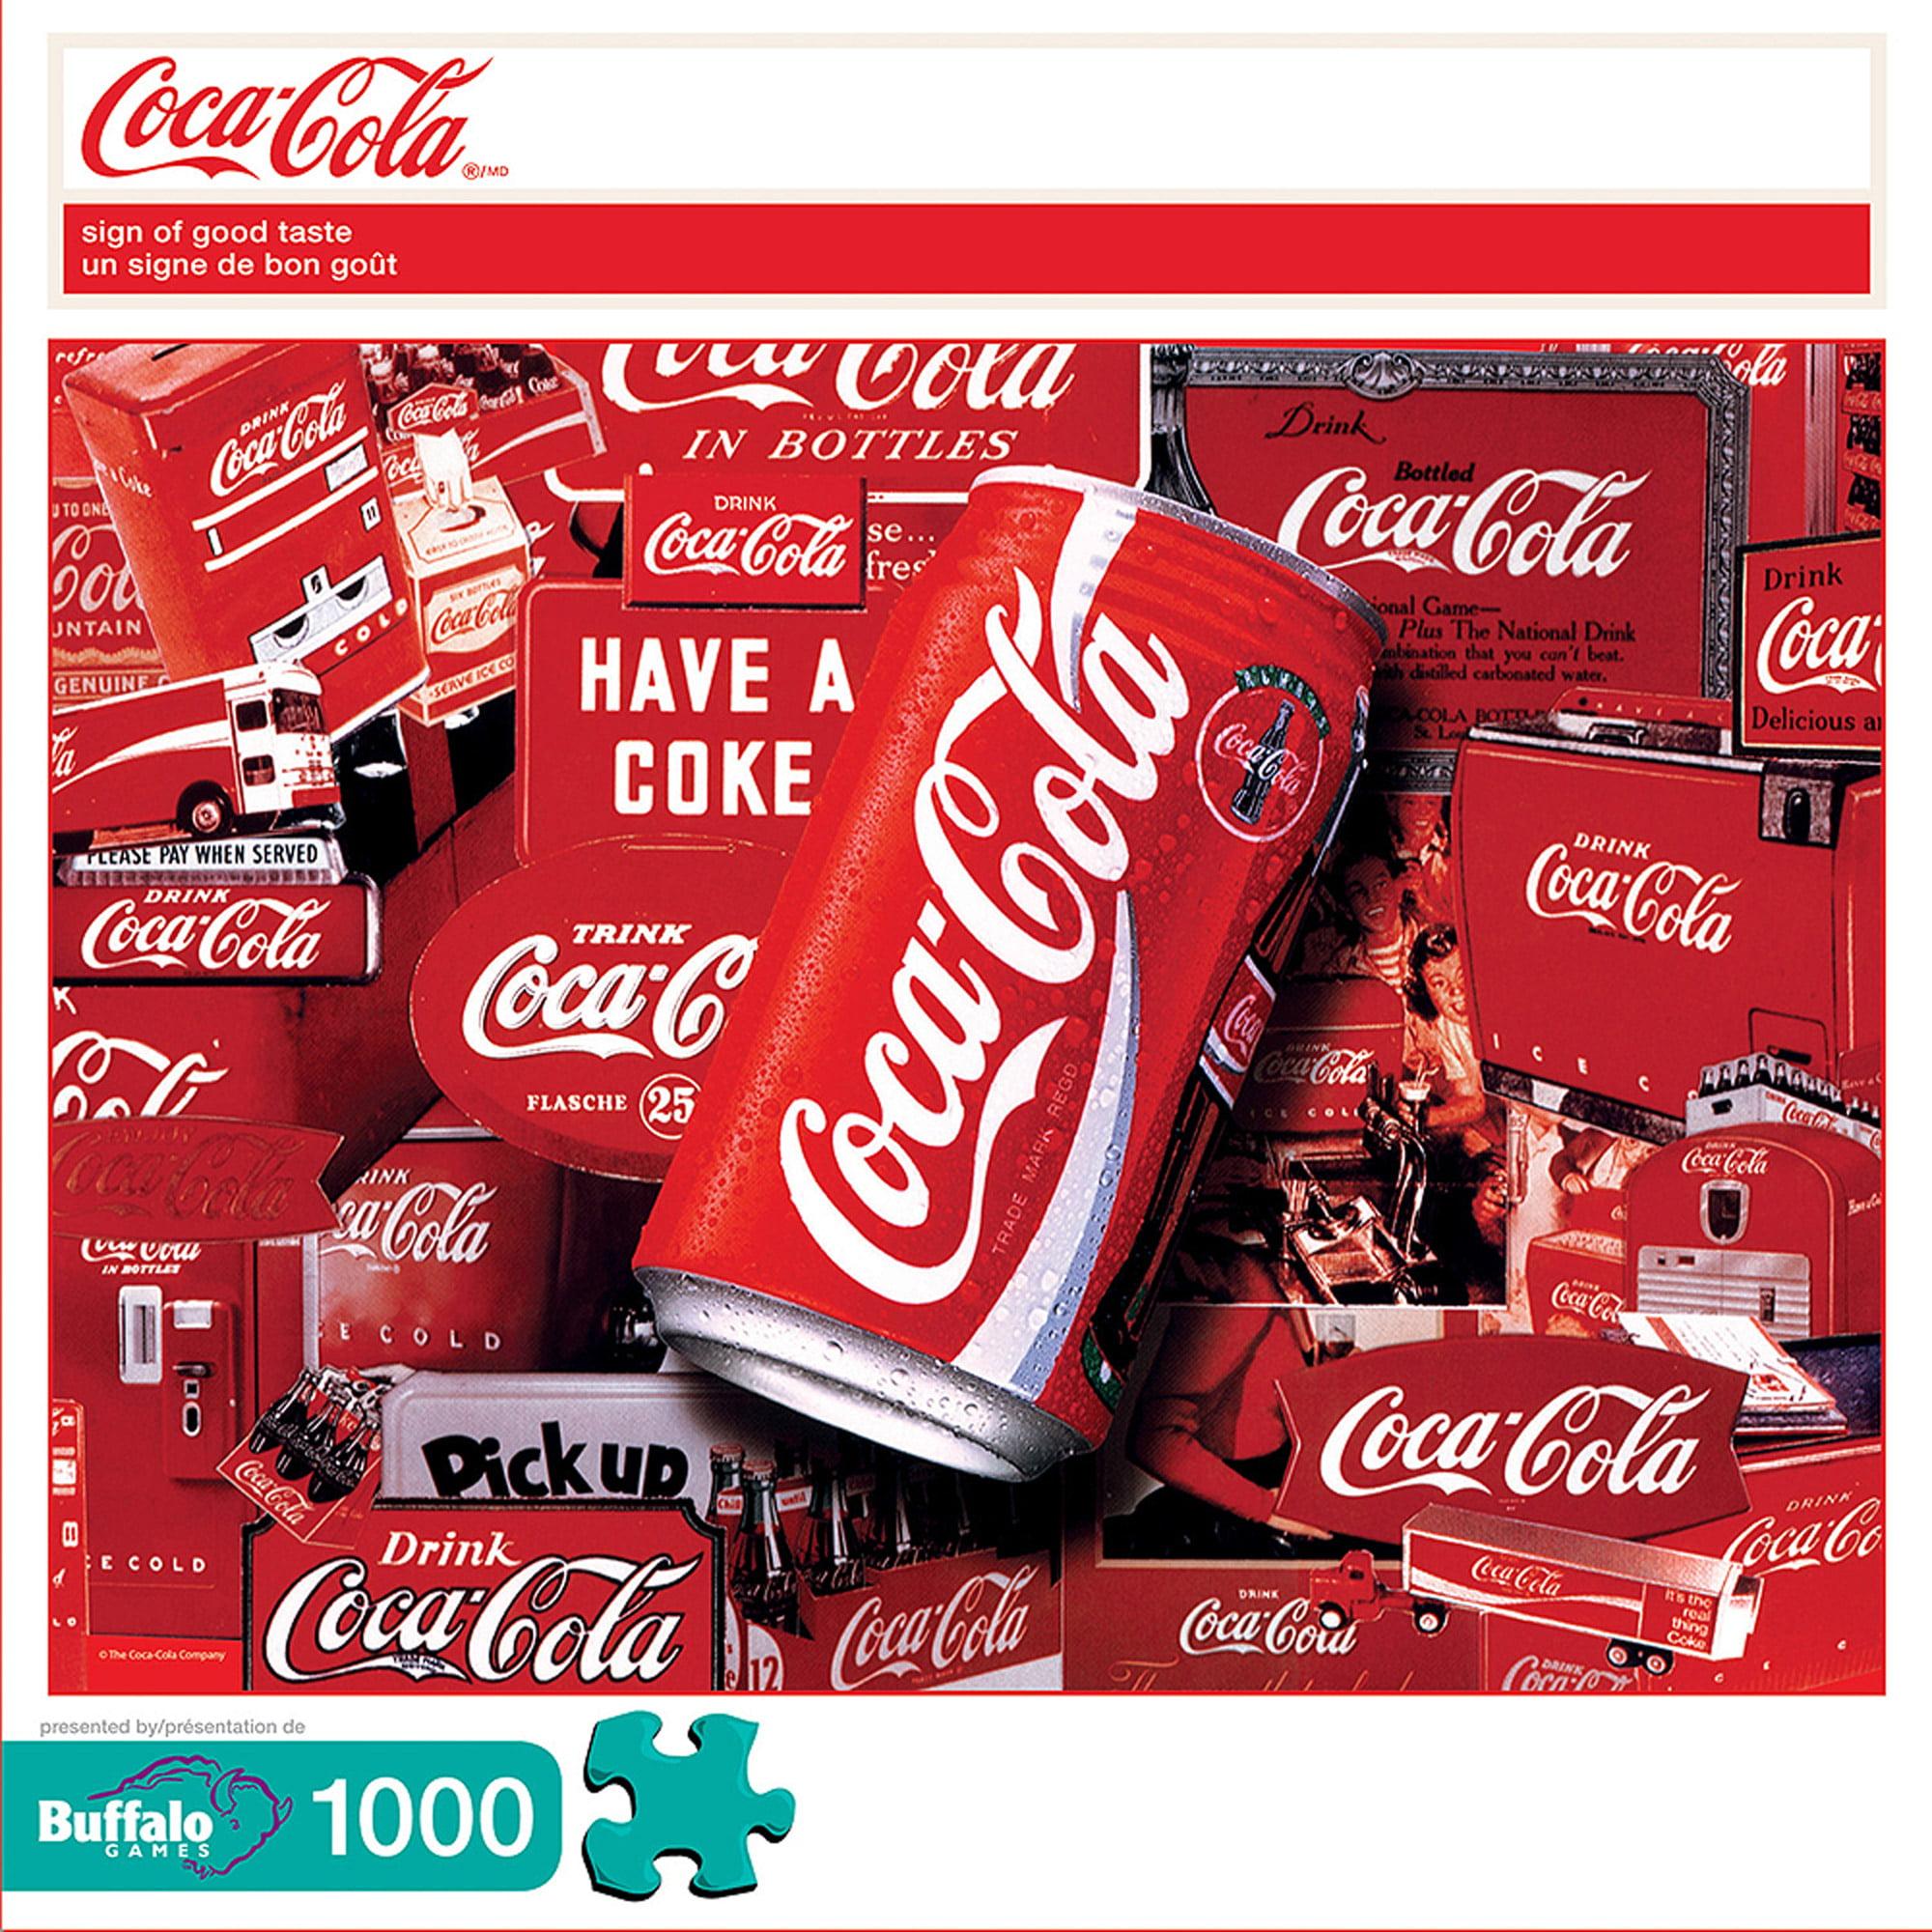 Coca Cola Sign of Good Taste Puzzle, 1000 Pieces